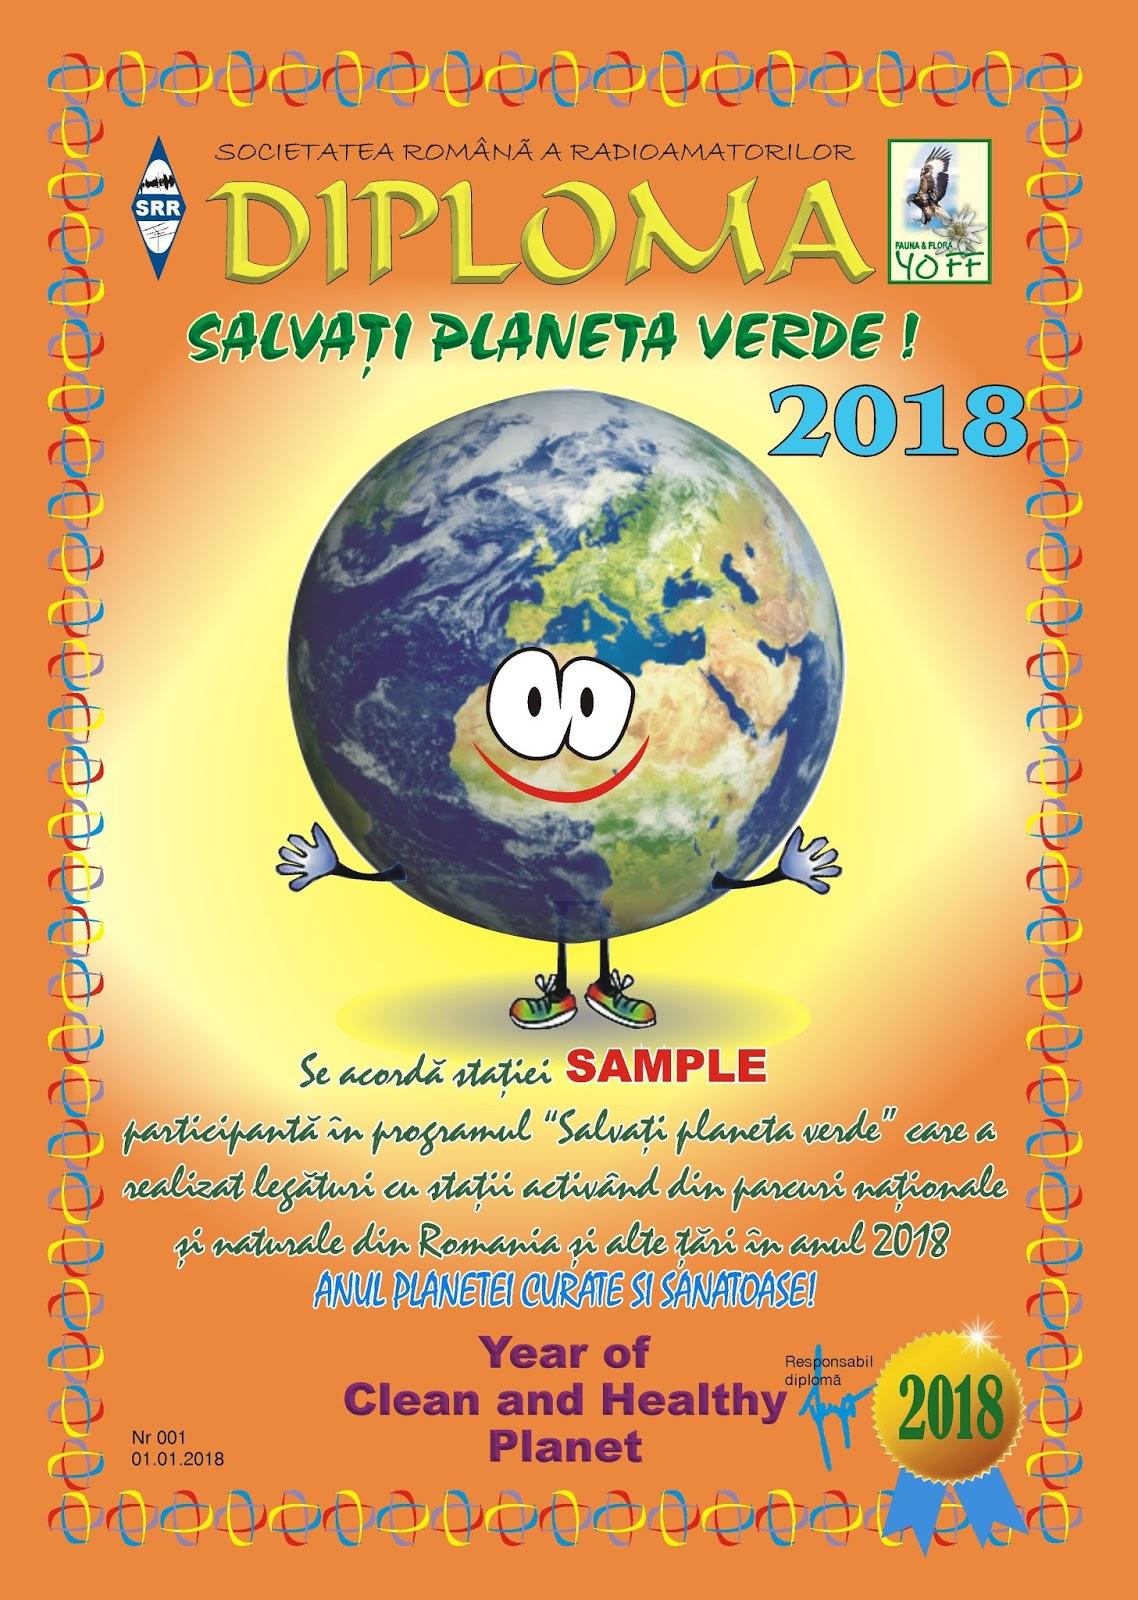 YOFF - FAUNA AND FLORA Romanian Program: Diploma YOFF 200, YOFF 1000 and more info!